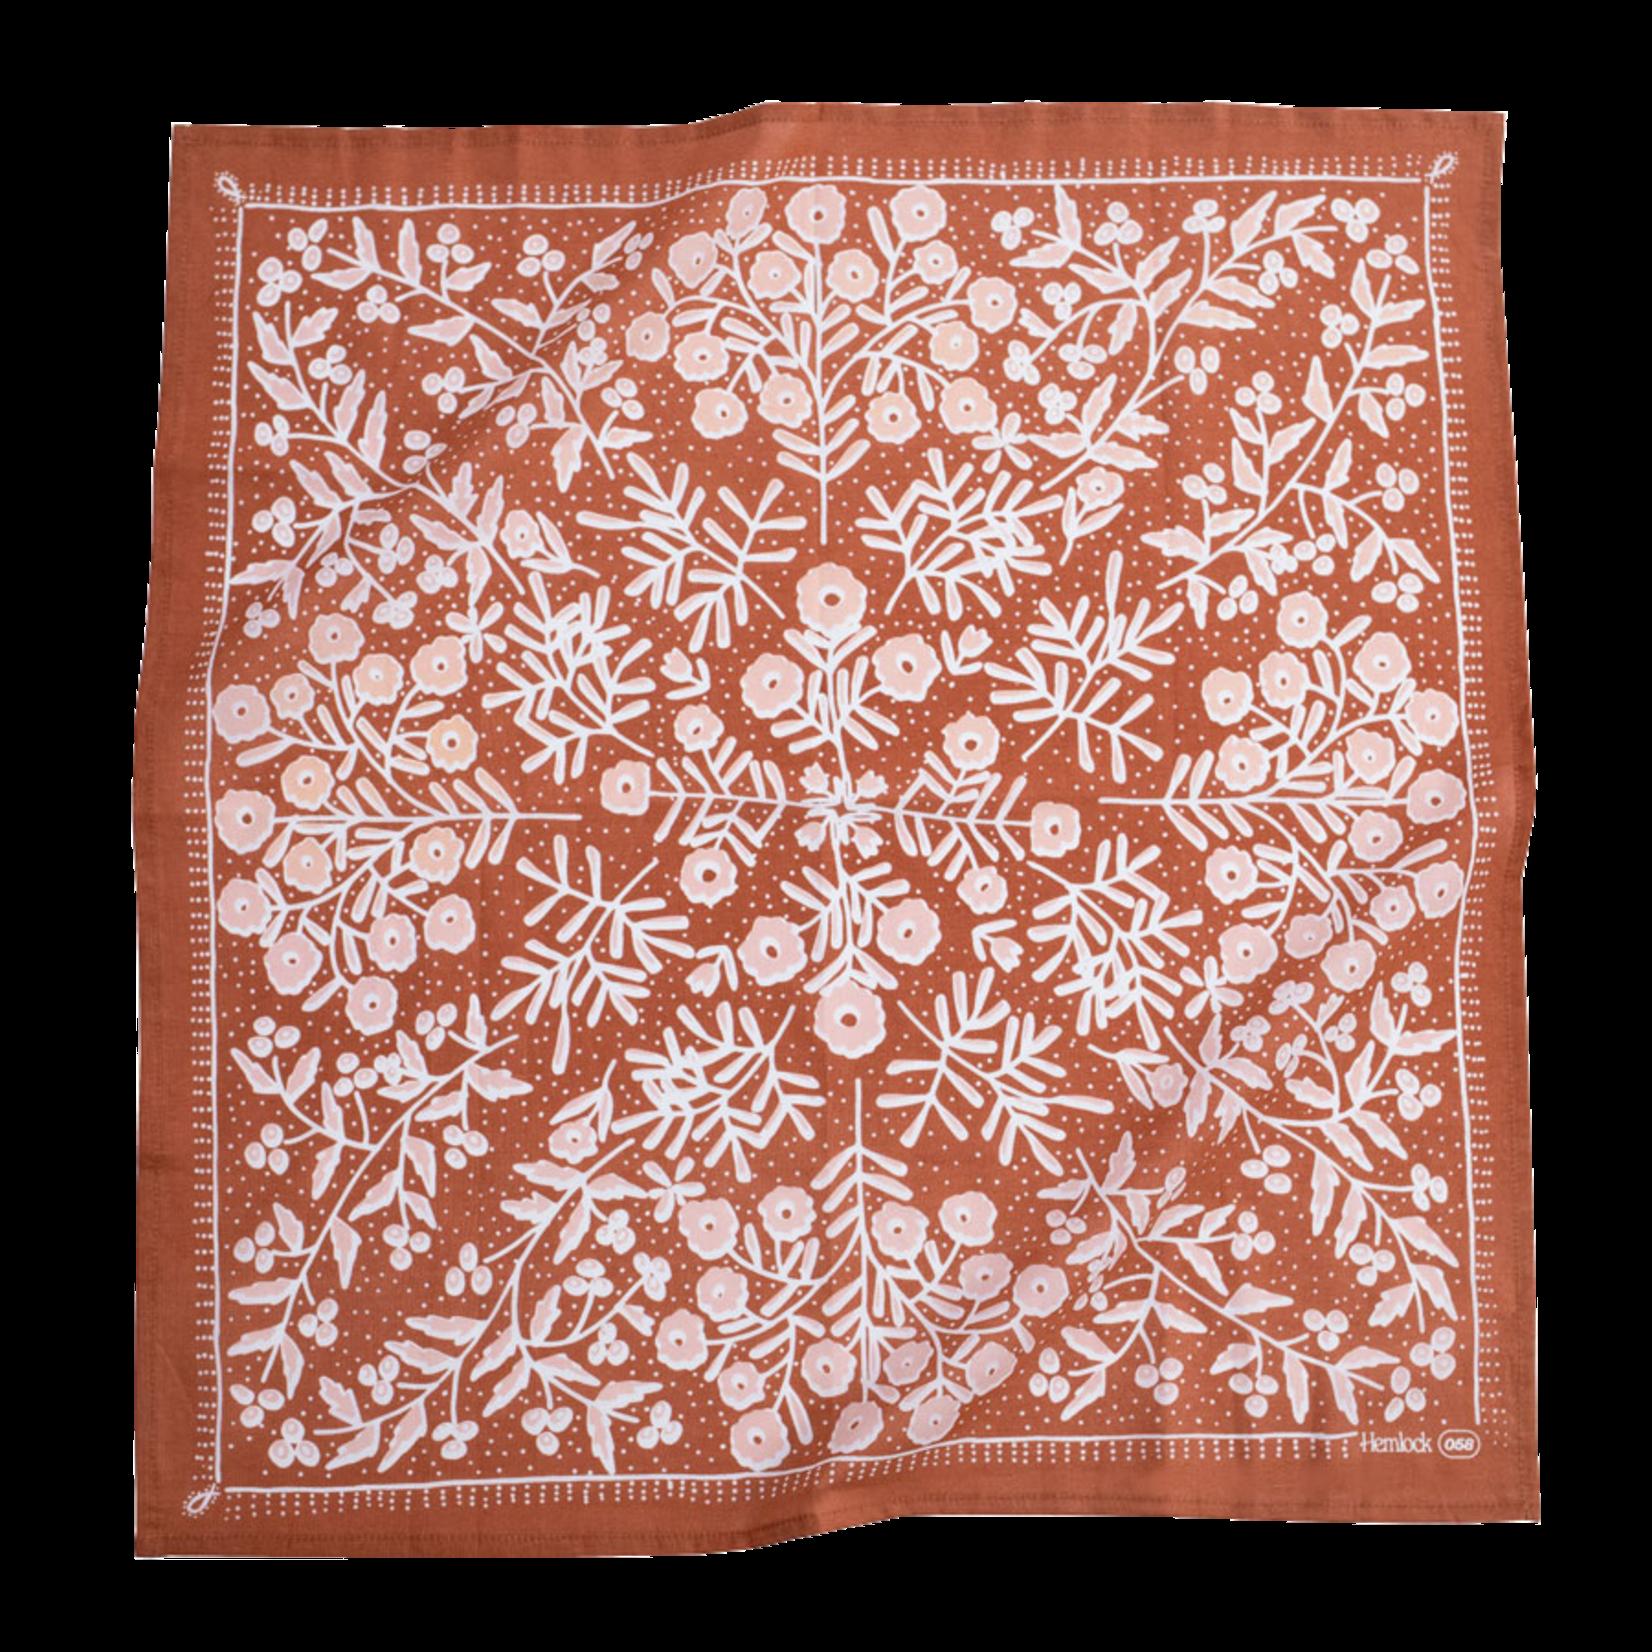 Handmade Cotton Bandana